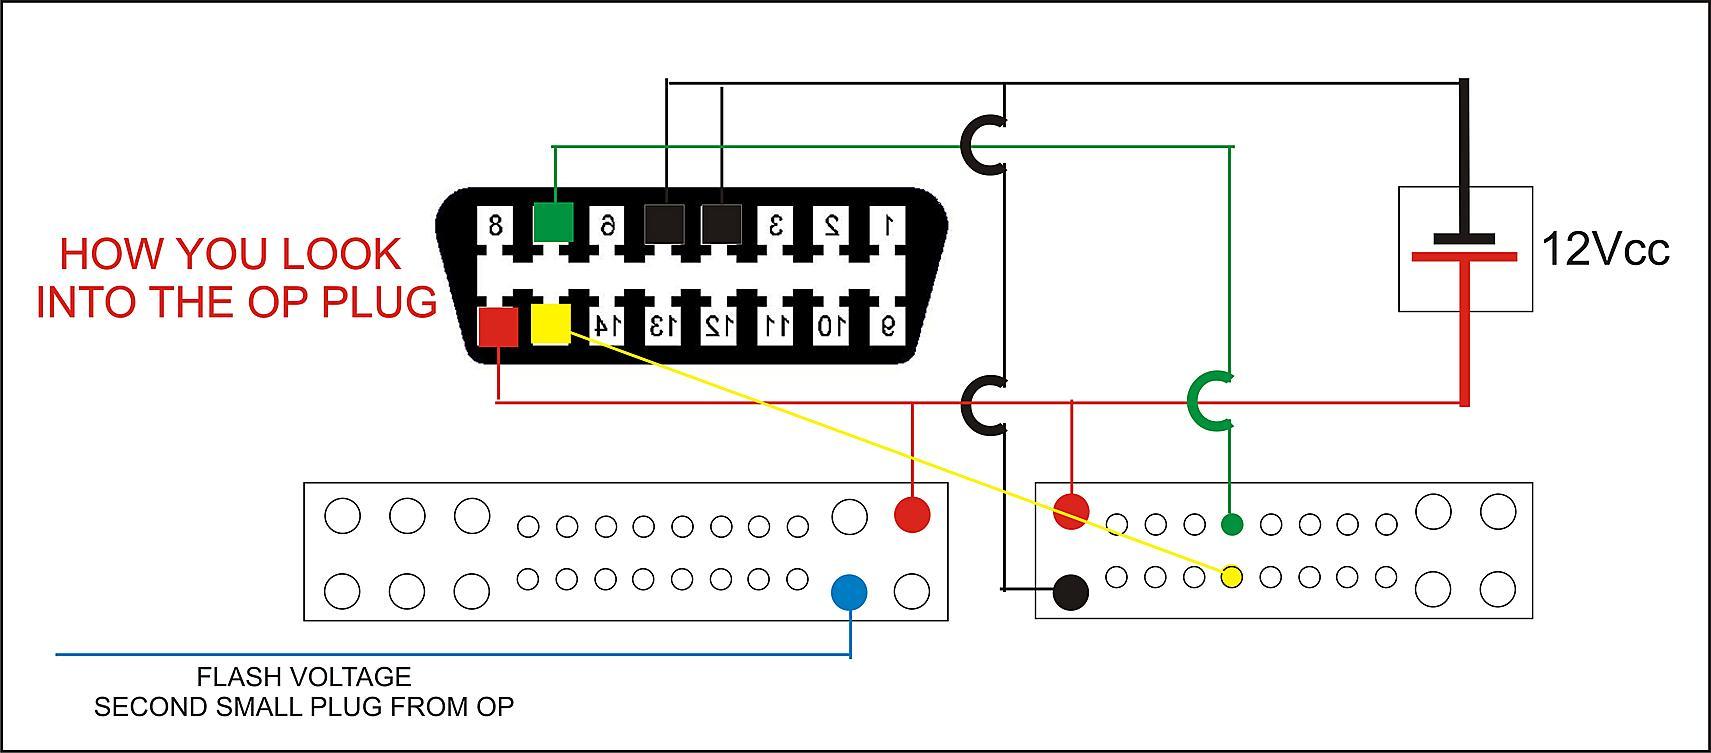 mitsubishi evo 3 wiring diagram pdf